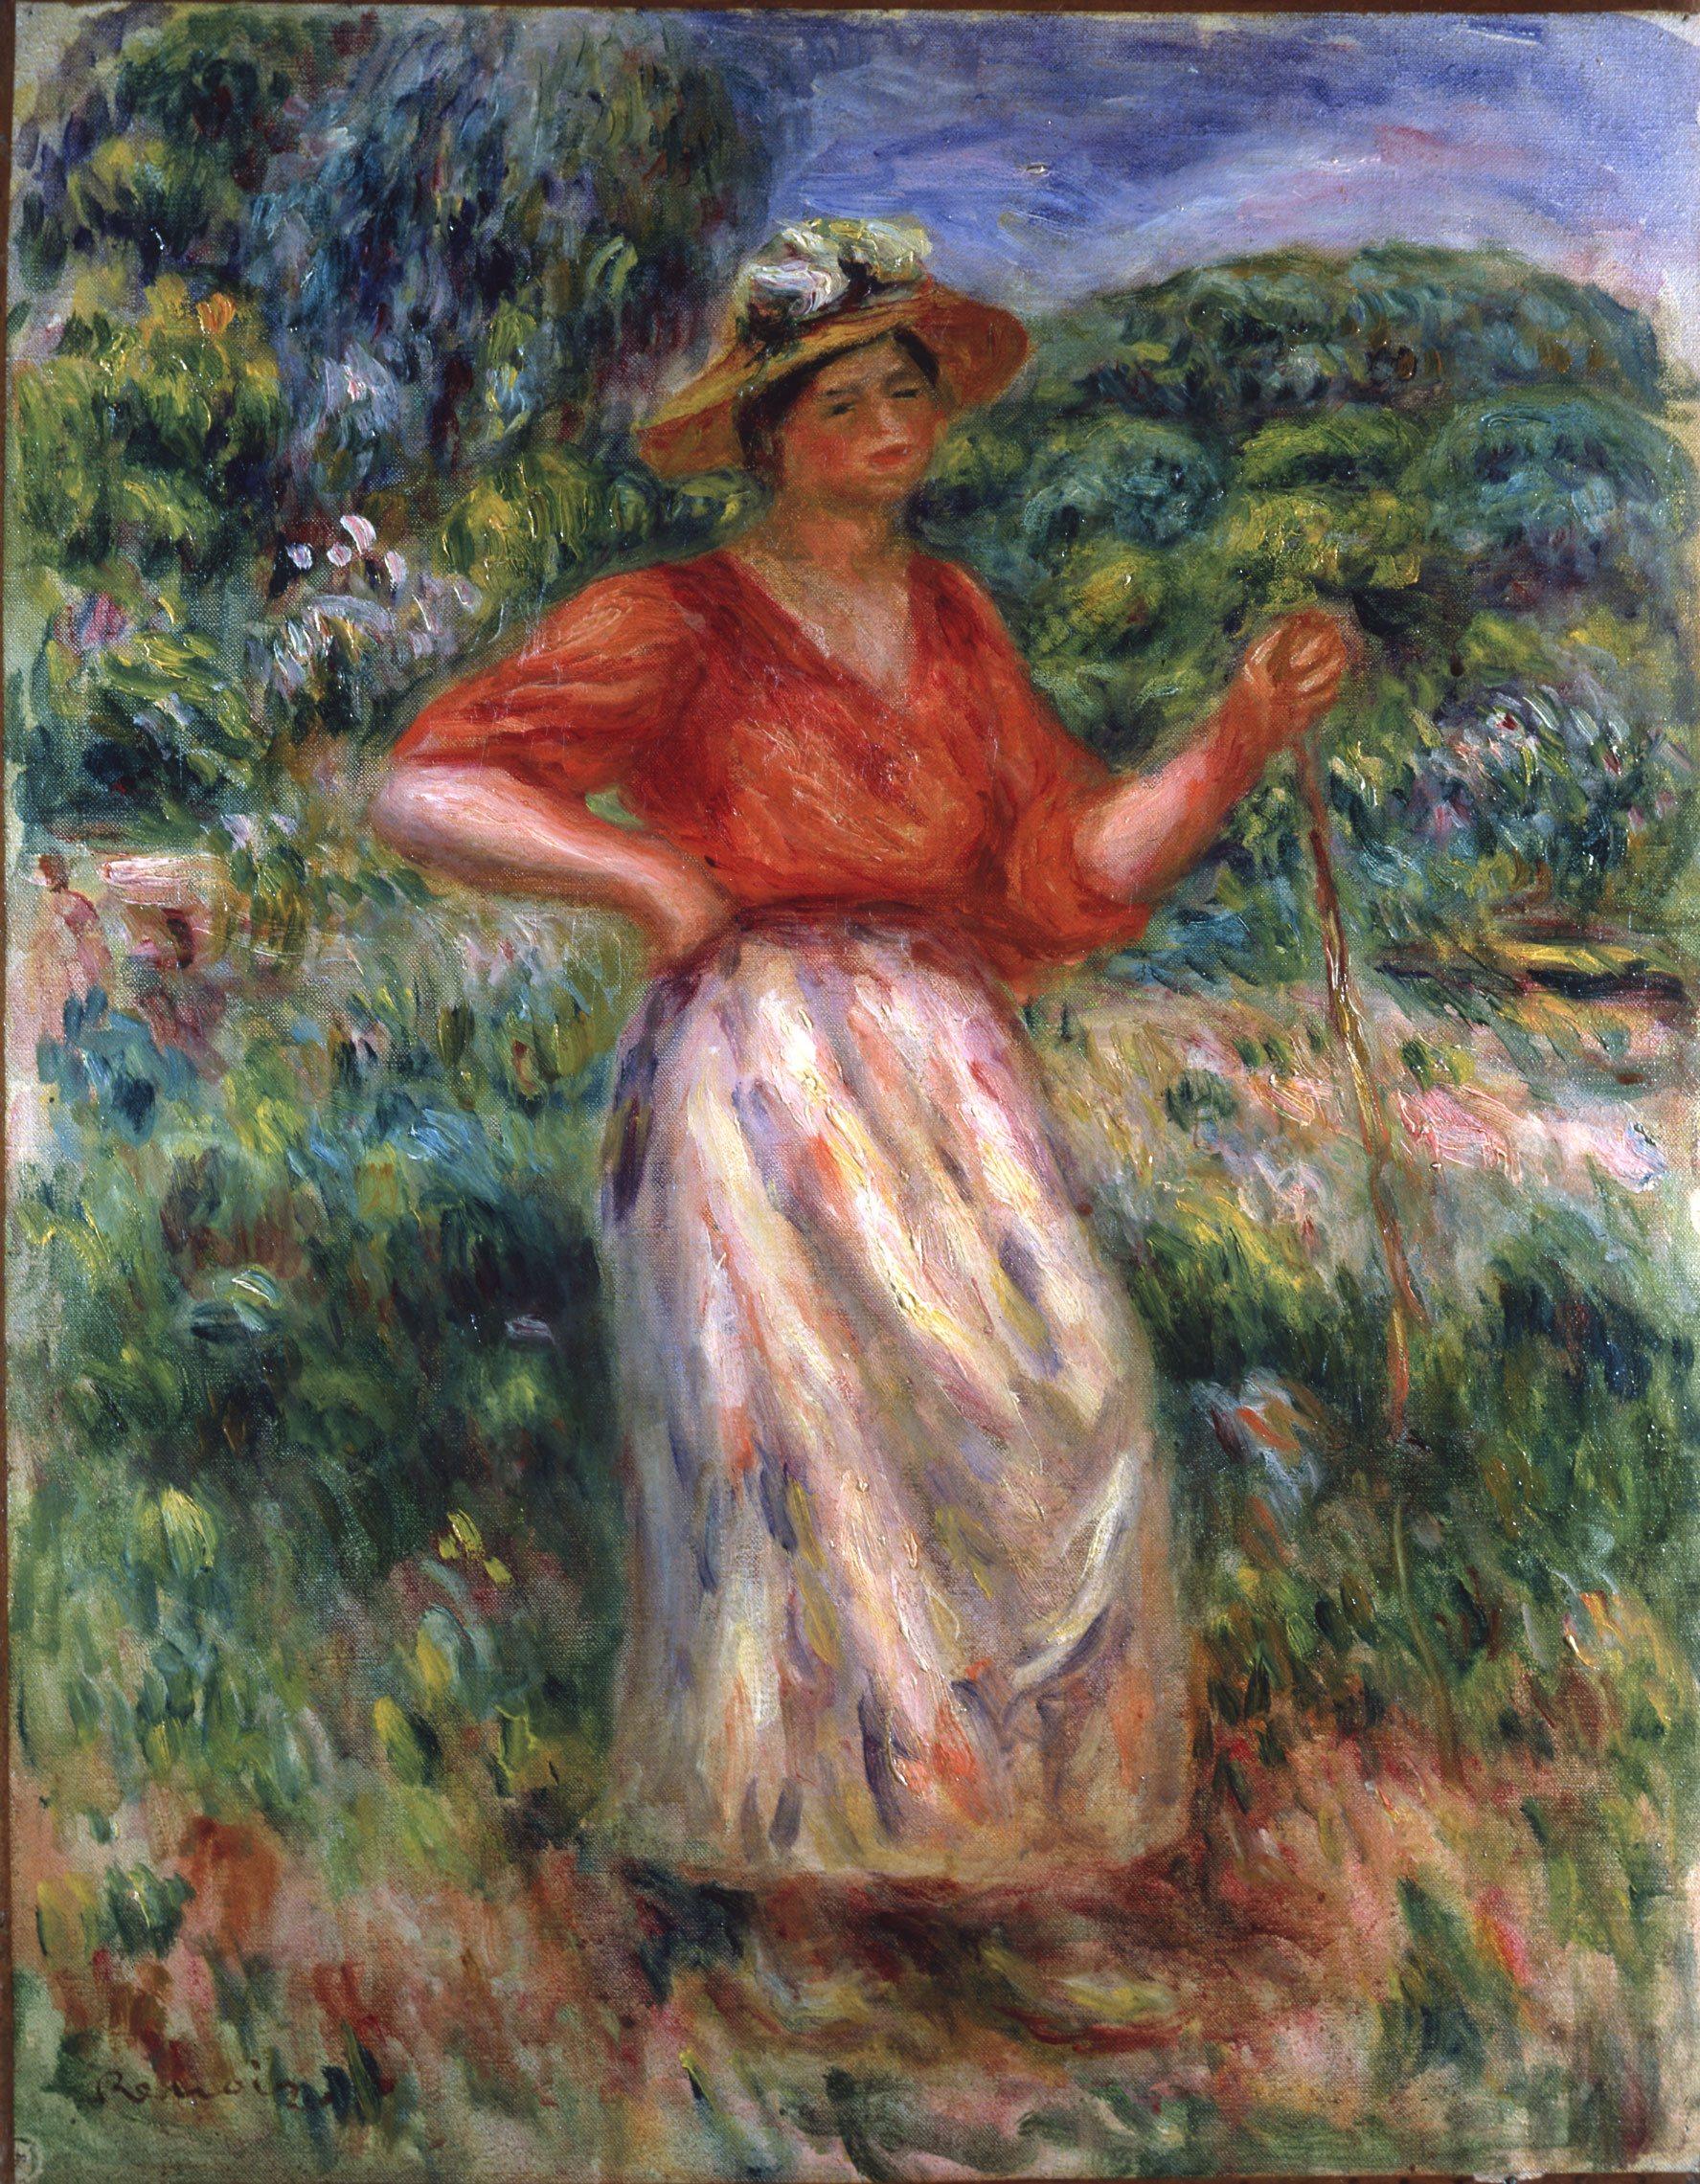 Renoir Pierre auguste,Femme marchand dans l'herbe,1913